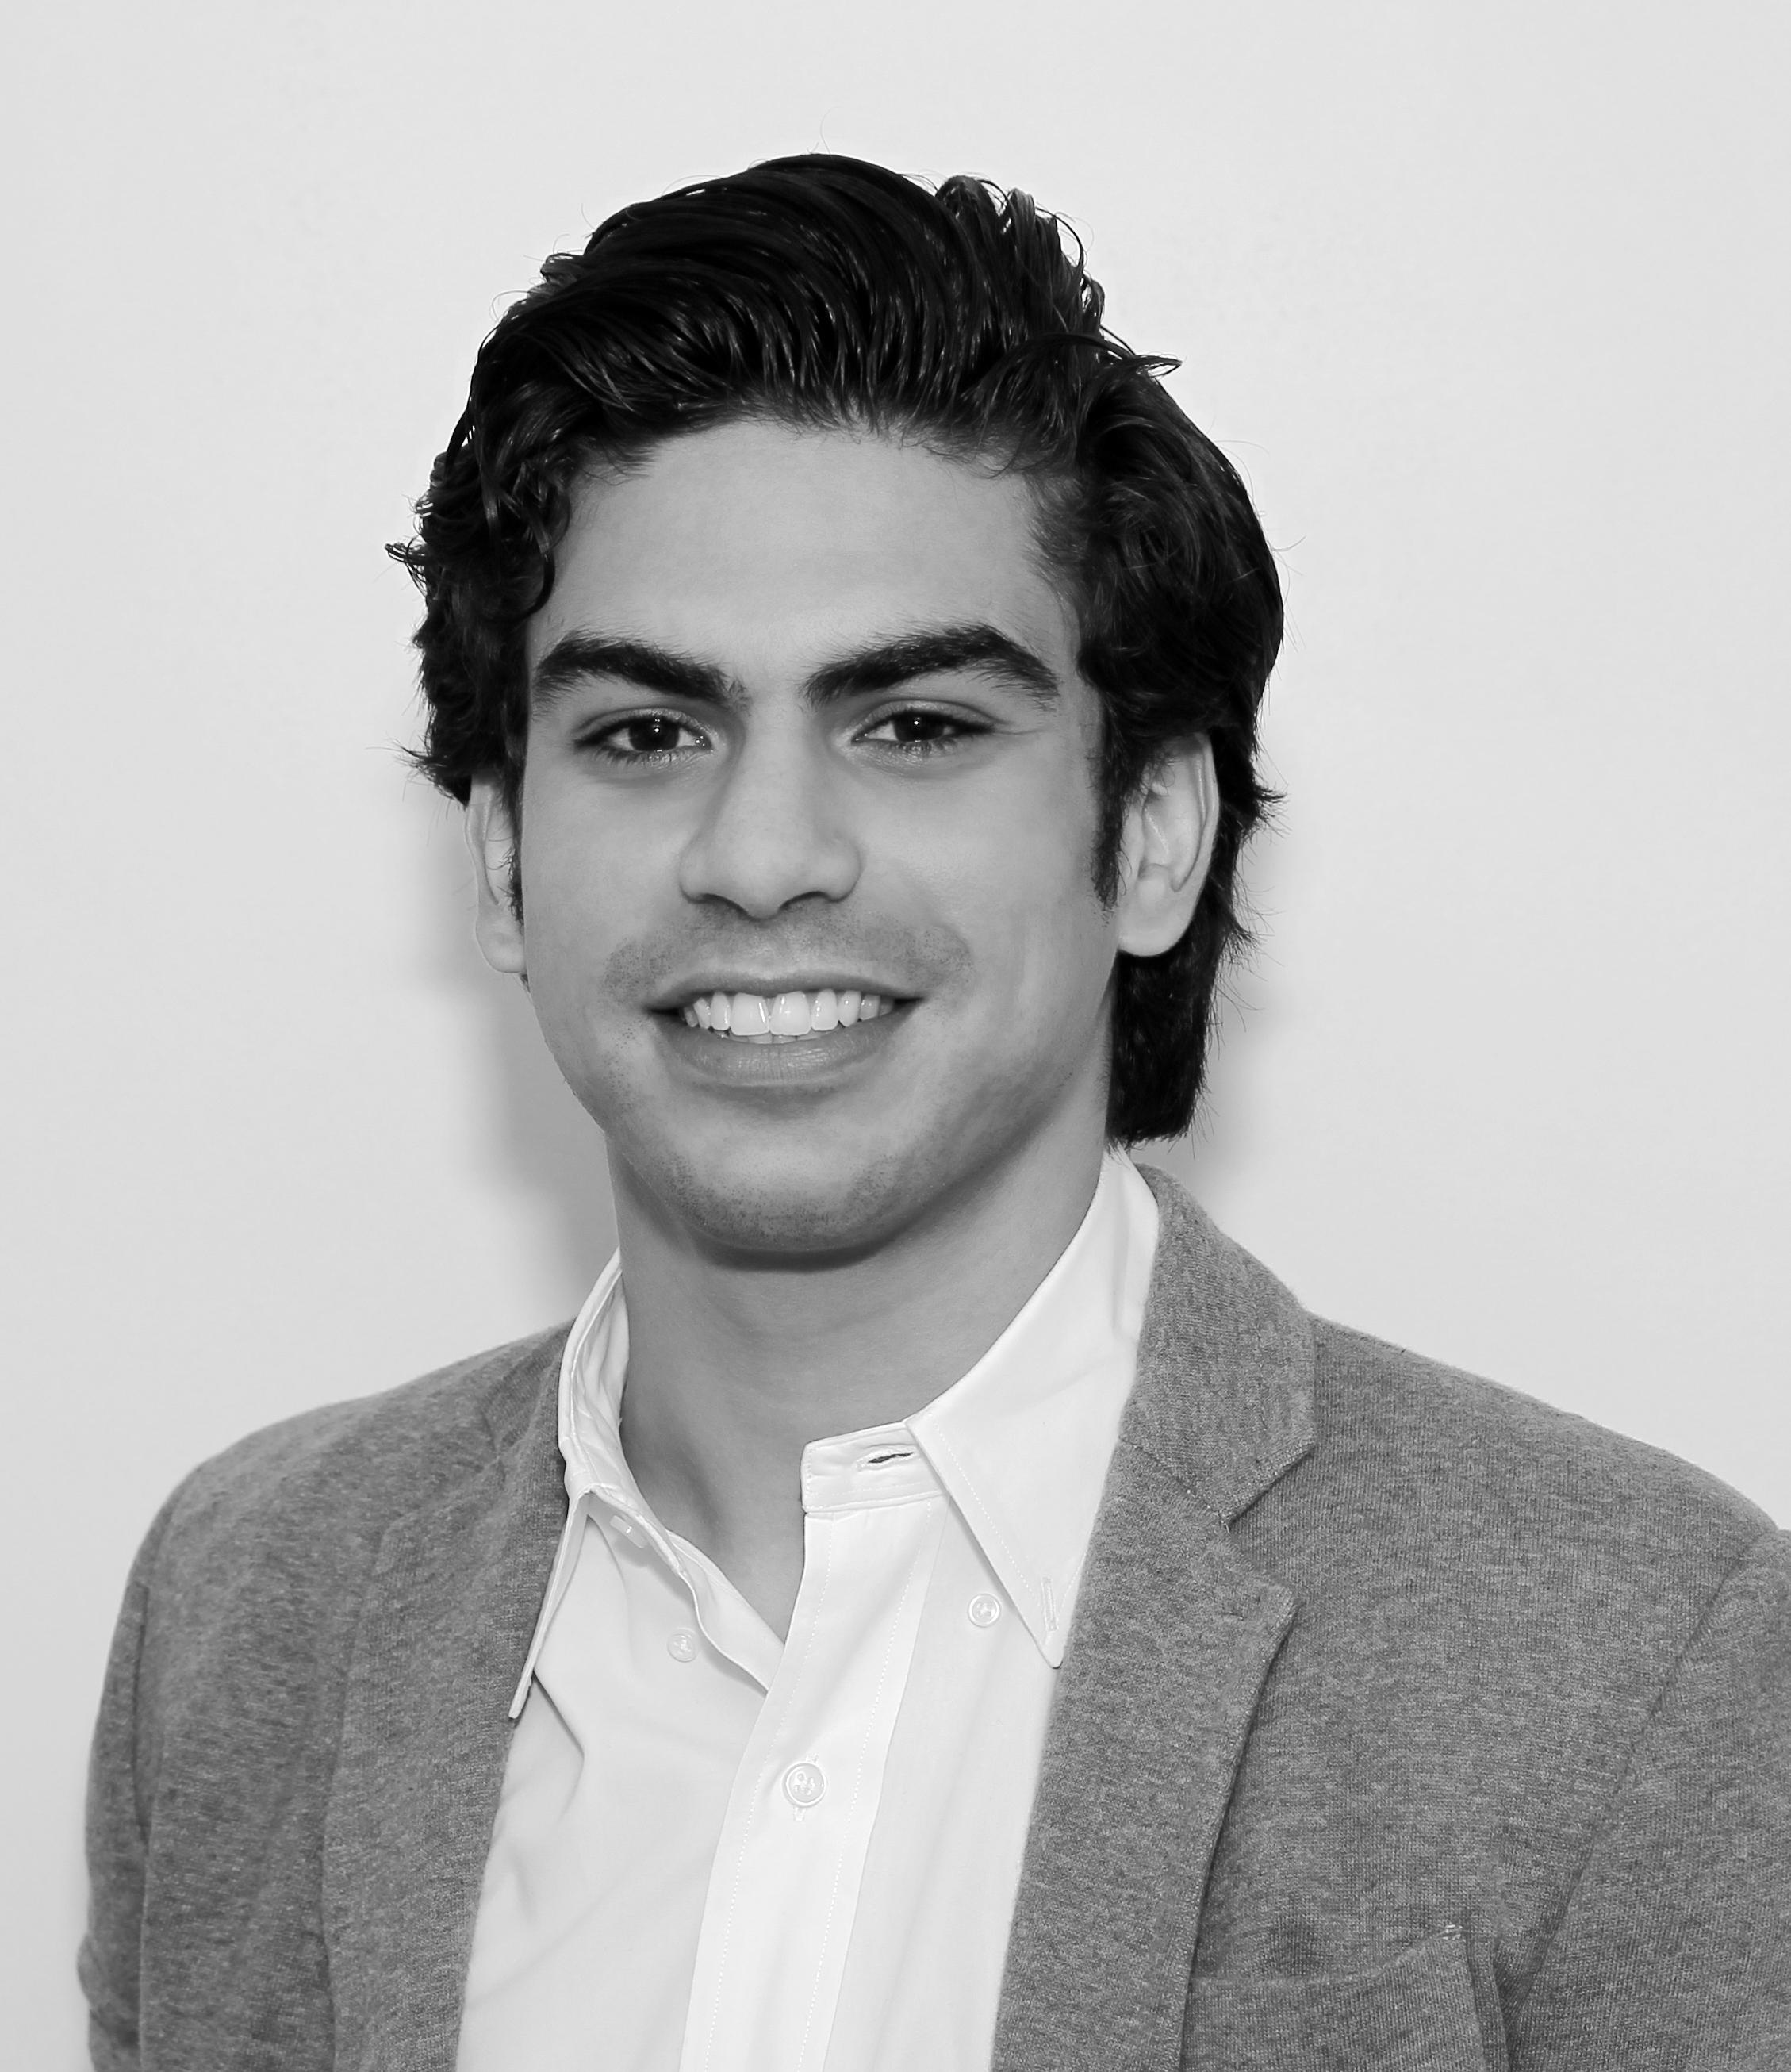 Andres Calleja